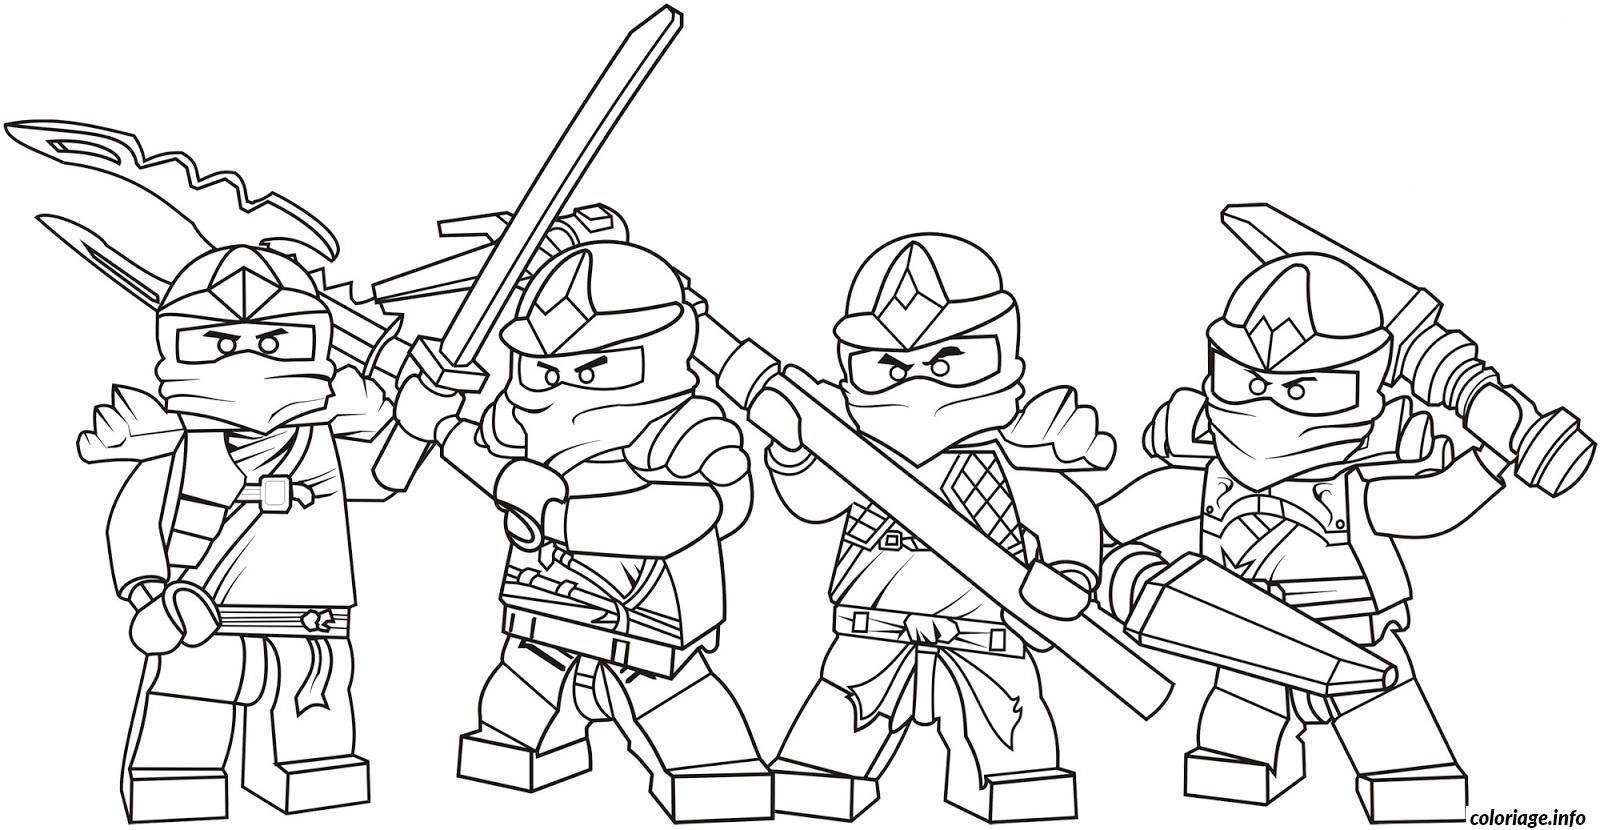 Lego Ninjago Team Coloriage 9651 In 2020 Lego Coloring Pages